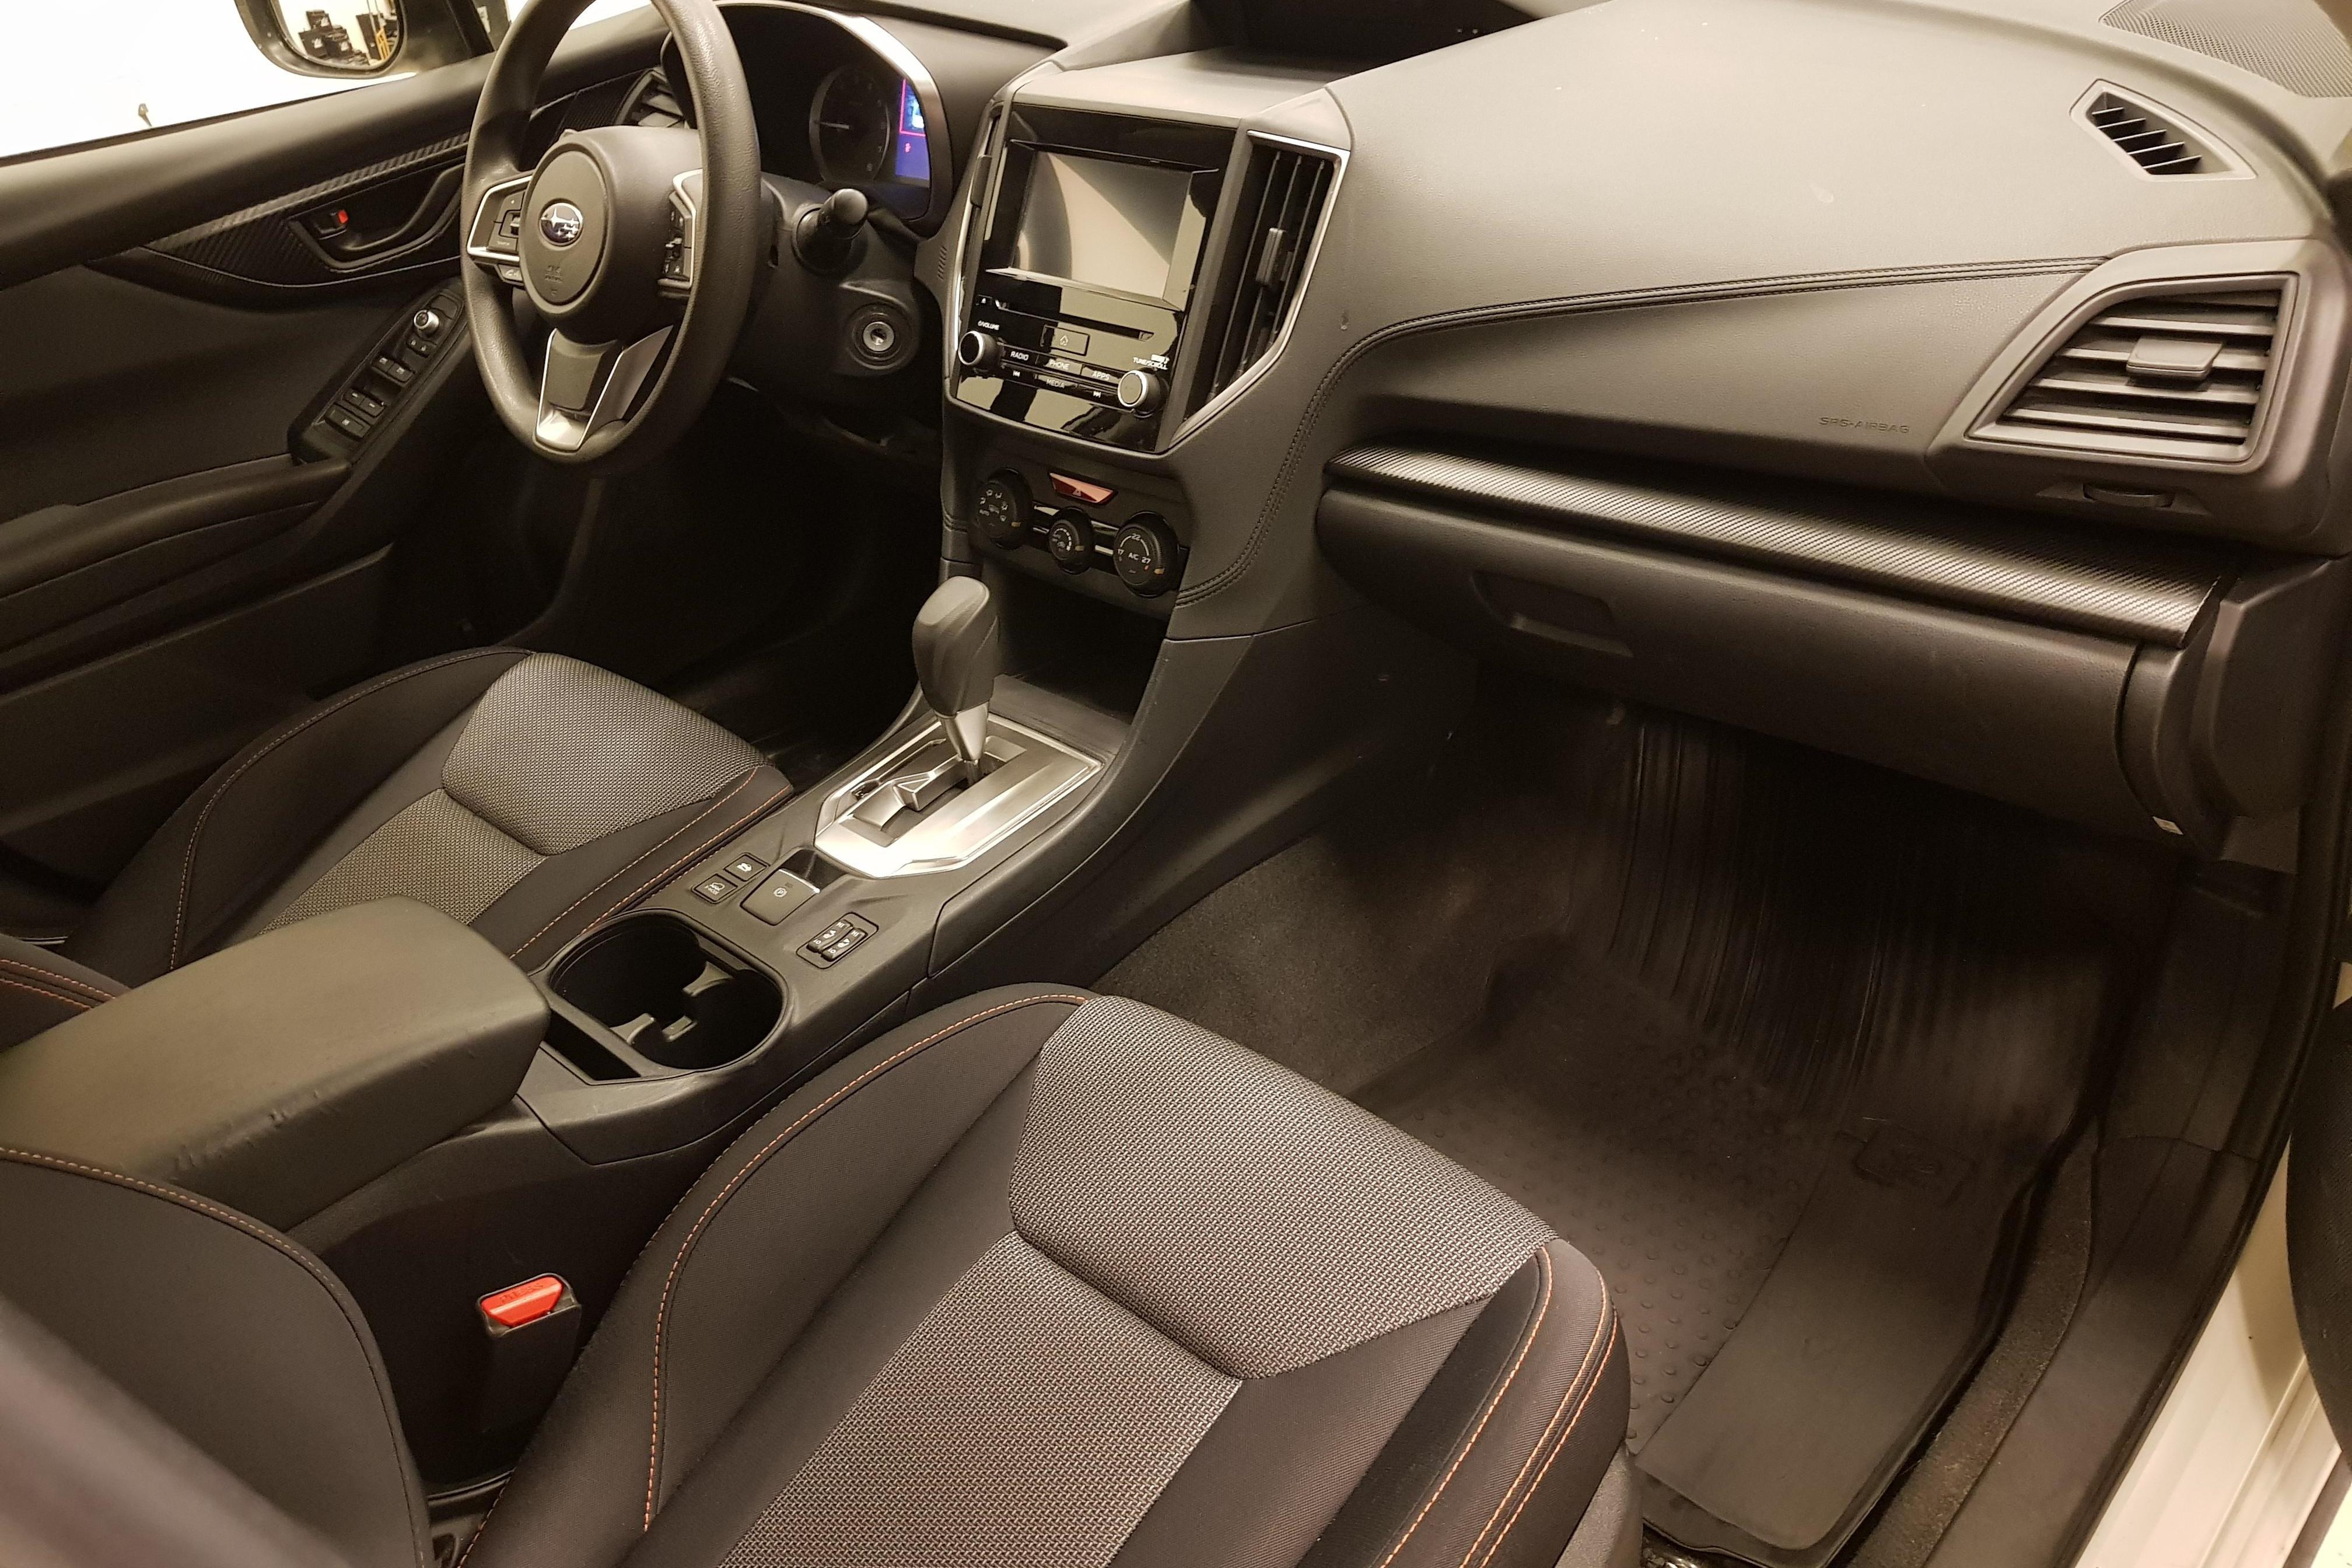 Subaru XV 1.6i (114hk) - 38 750 km - Automatic - white - 2018